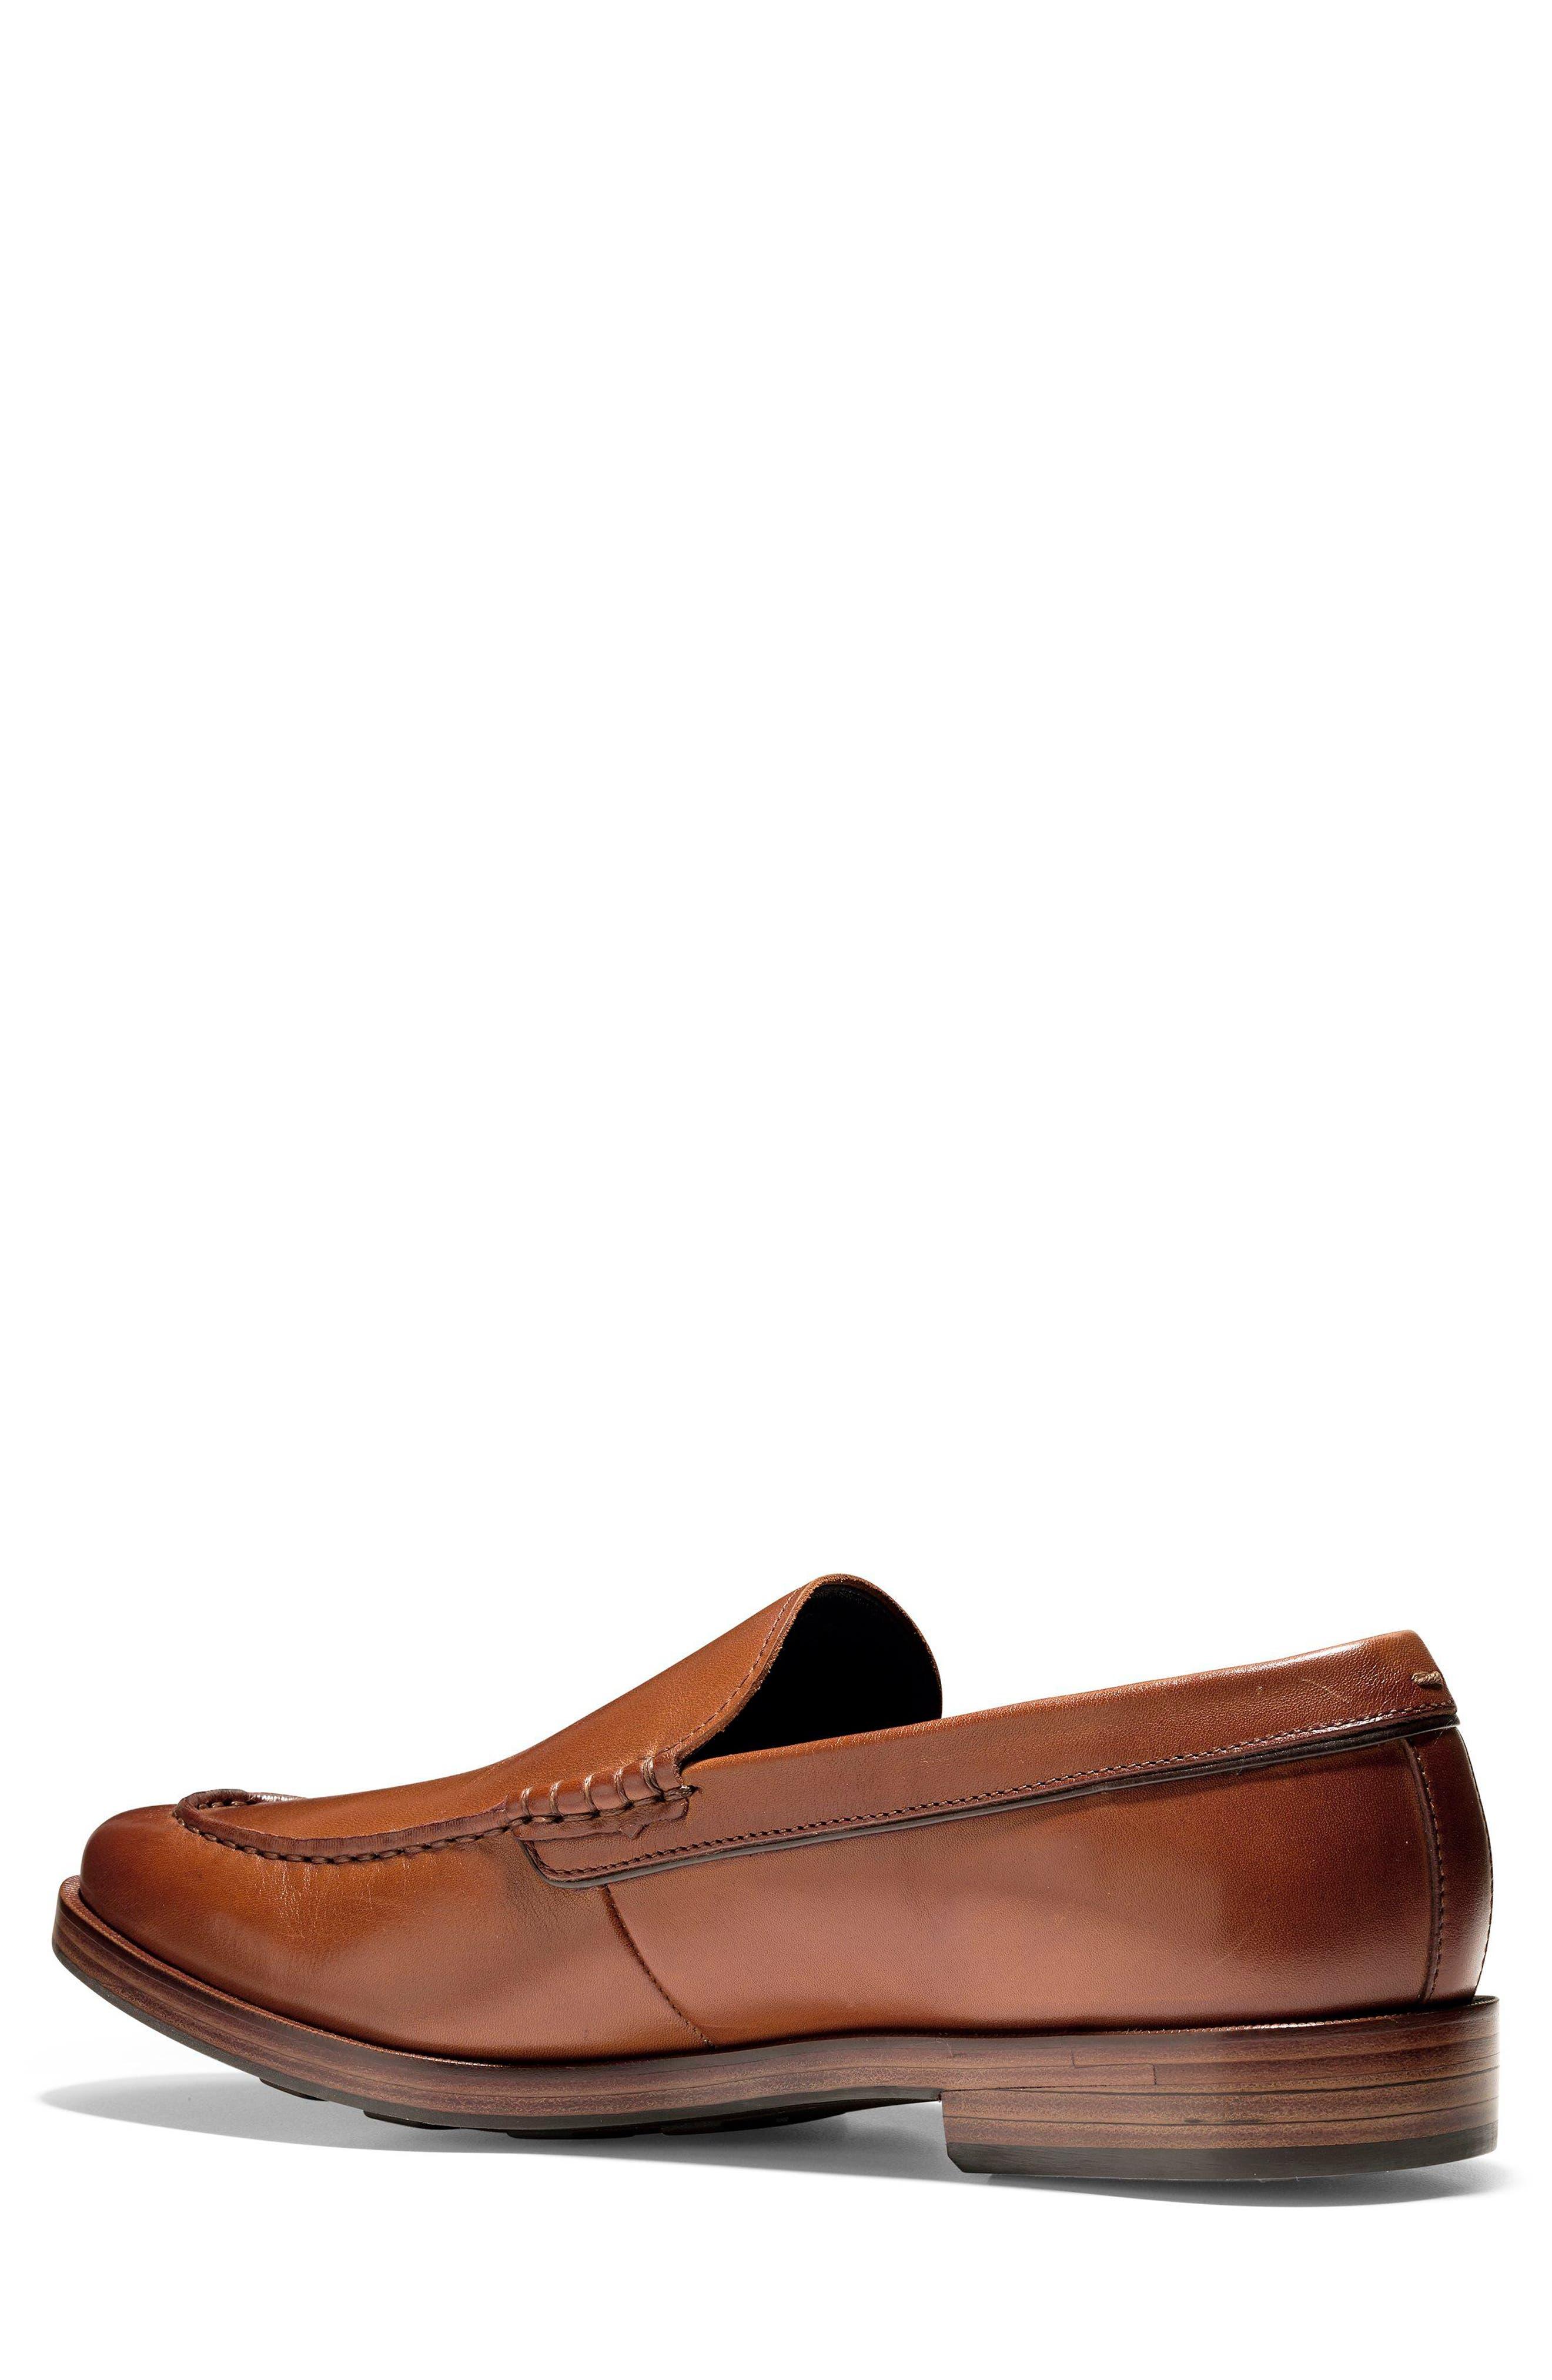 Hamilton Grand Venetian Loafer,                             Alternate thumbnail 2, color,                             British Tan